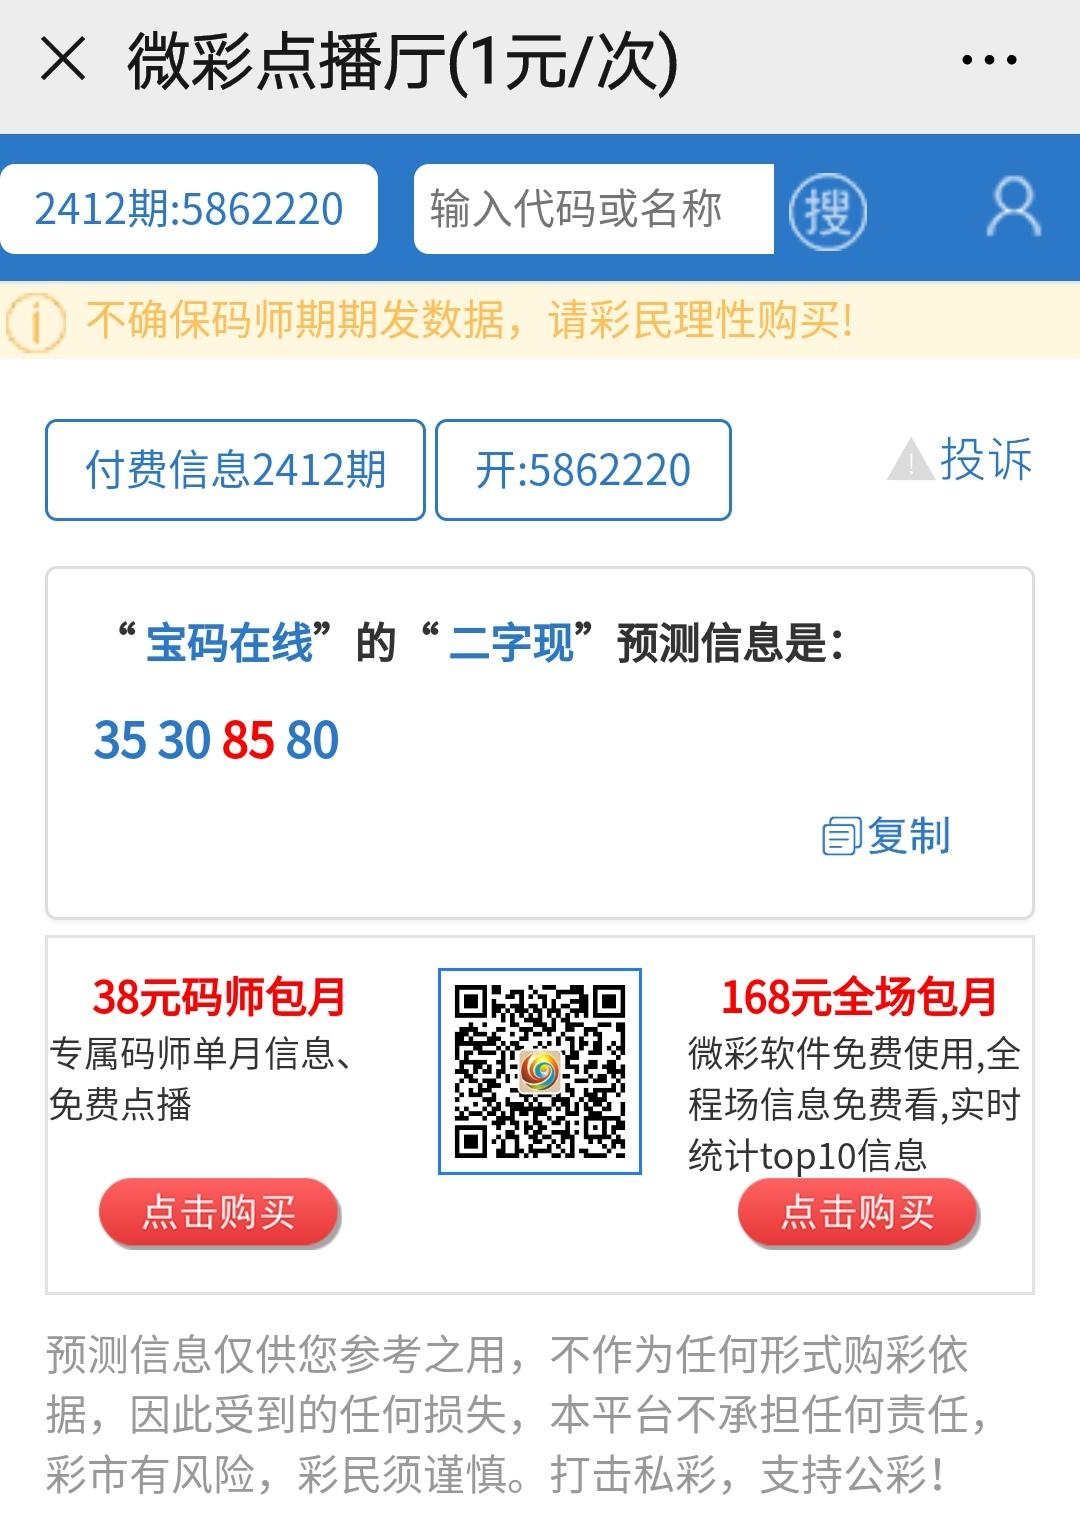 IMG_20200324_210455.jpg